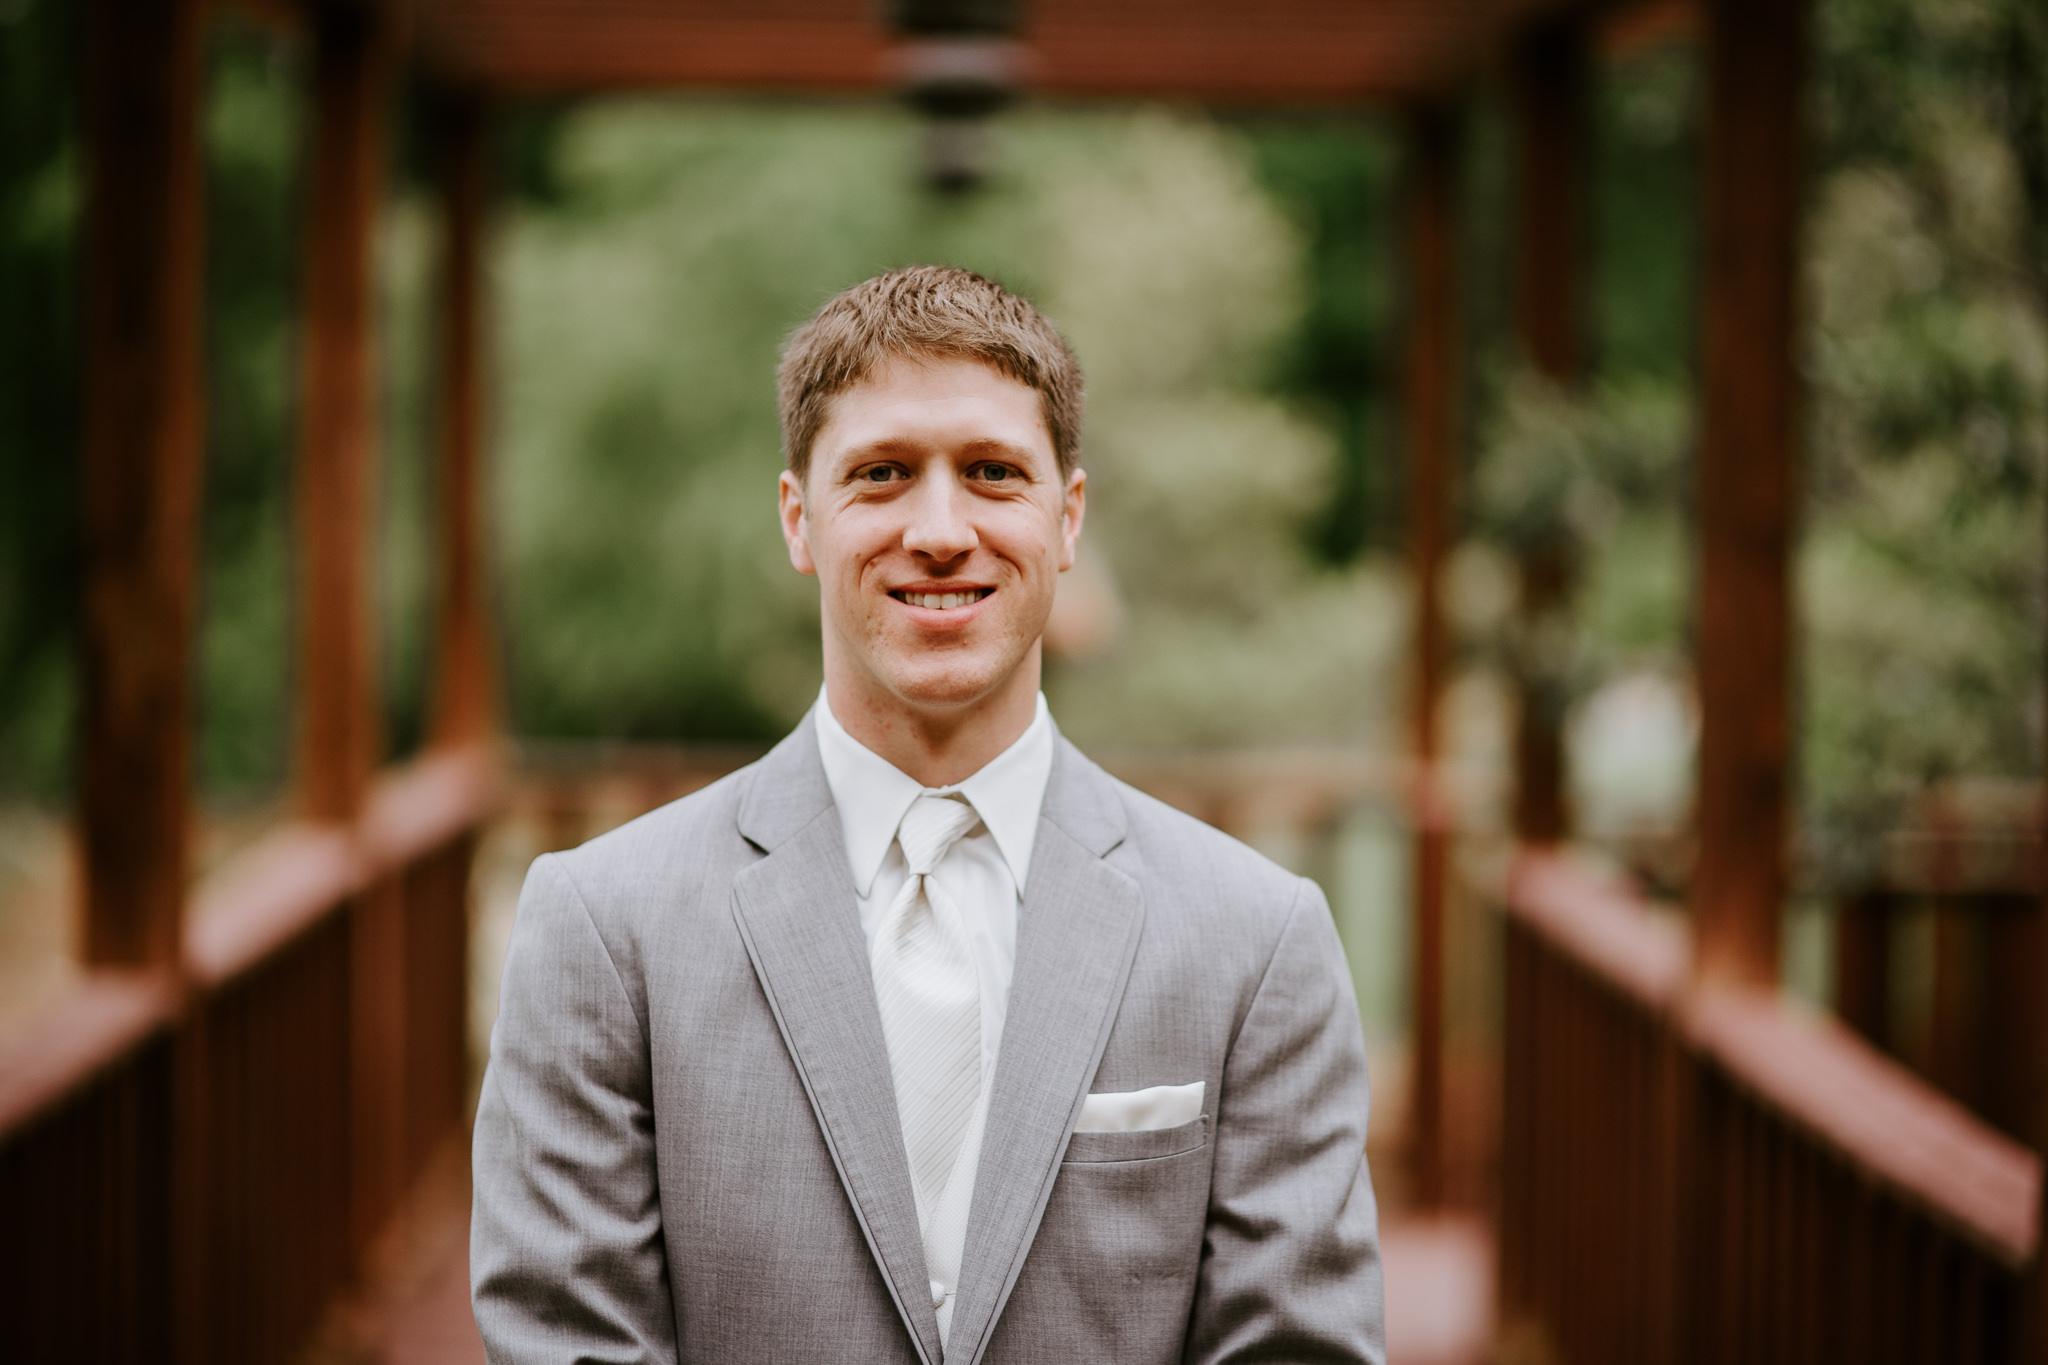 House Mountain Inn - Weddings - Lexington - Virginia - Best Wedding Photographer - Pat Cori Photography-21.jpg